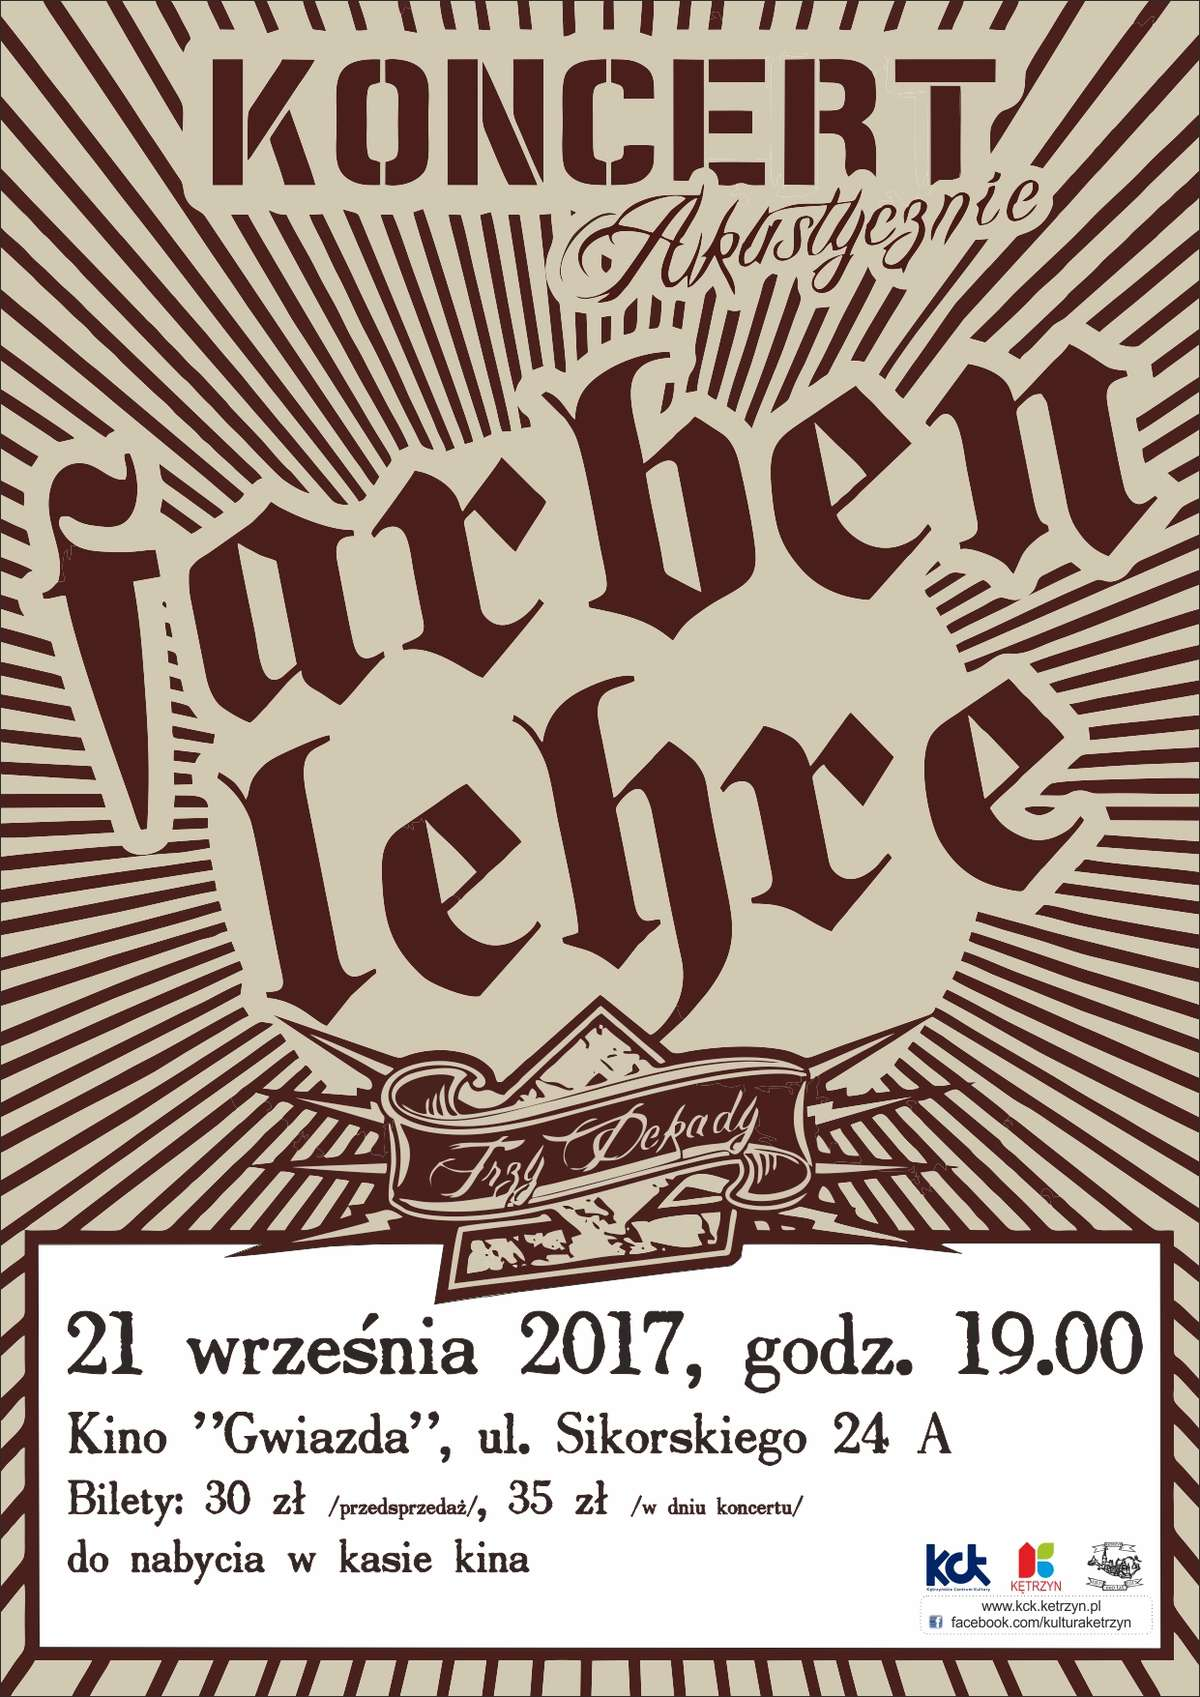 Farben Lehre akustycznie - full image